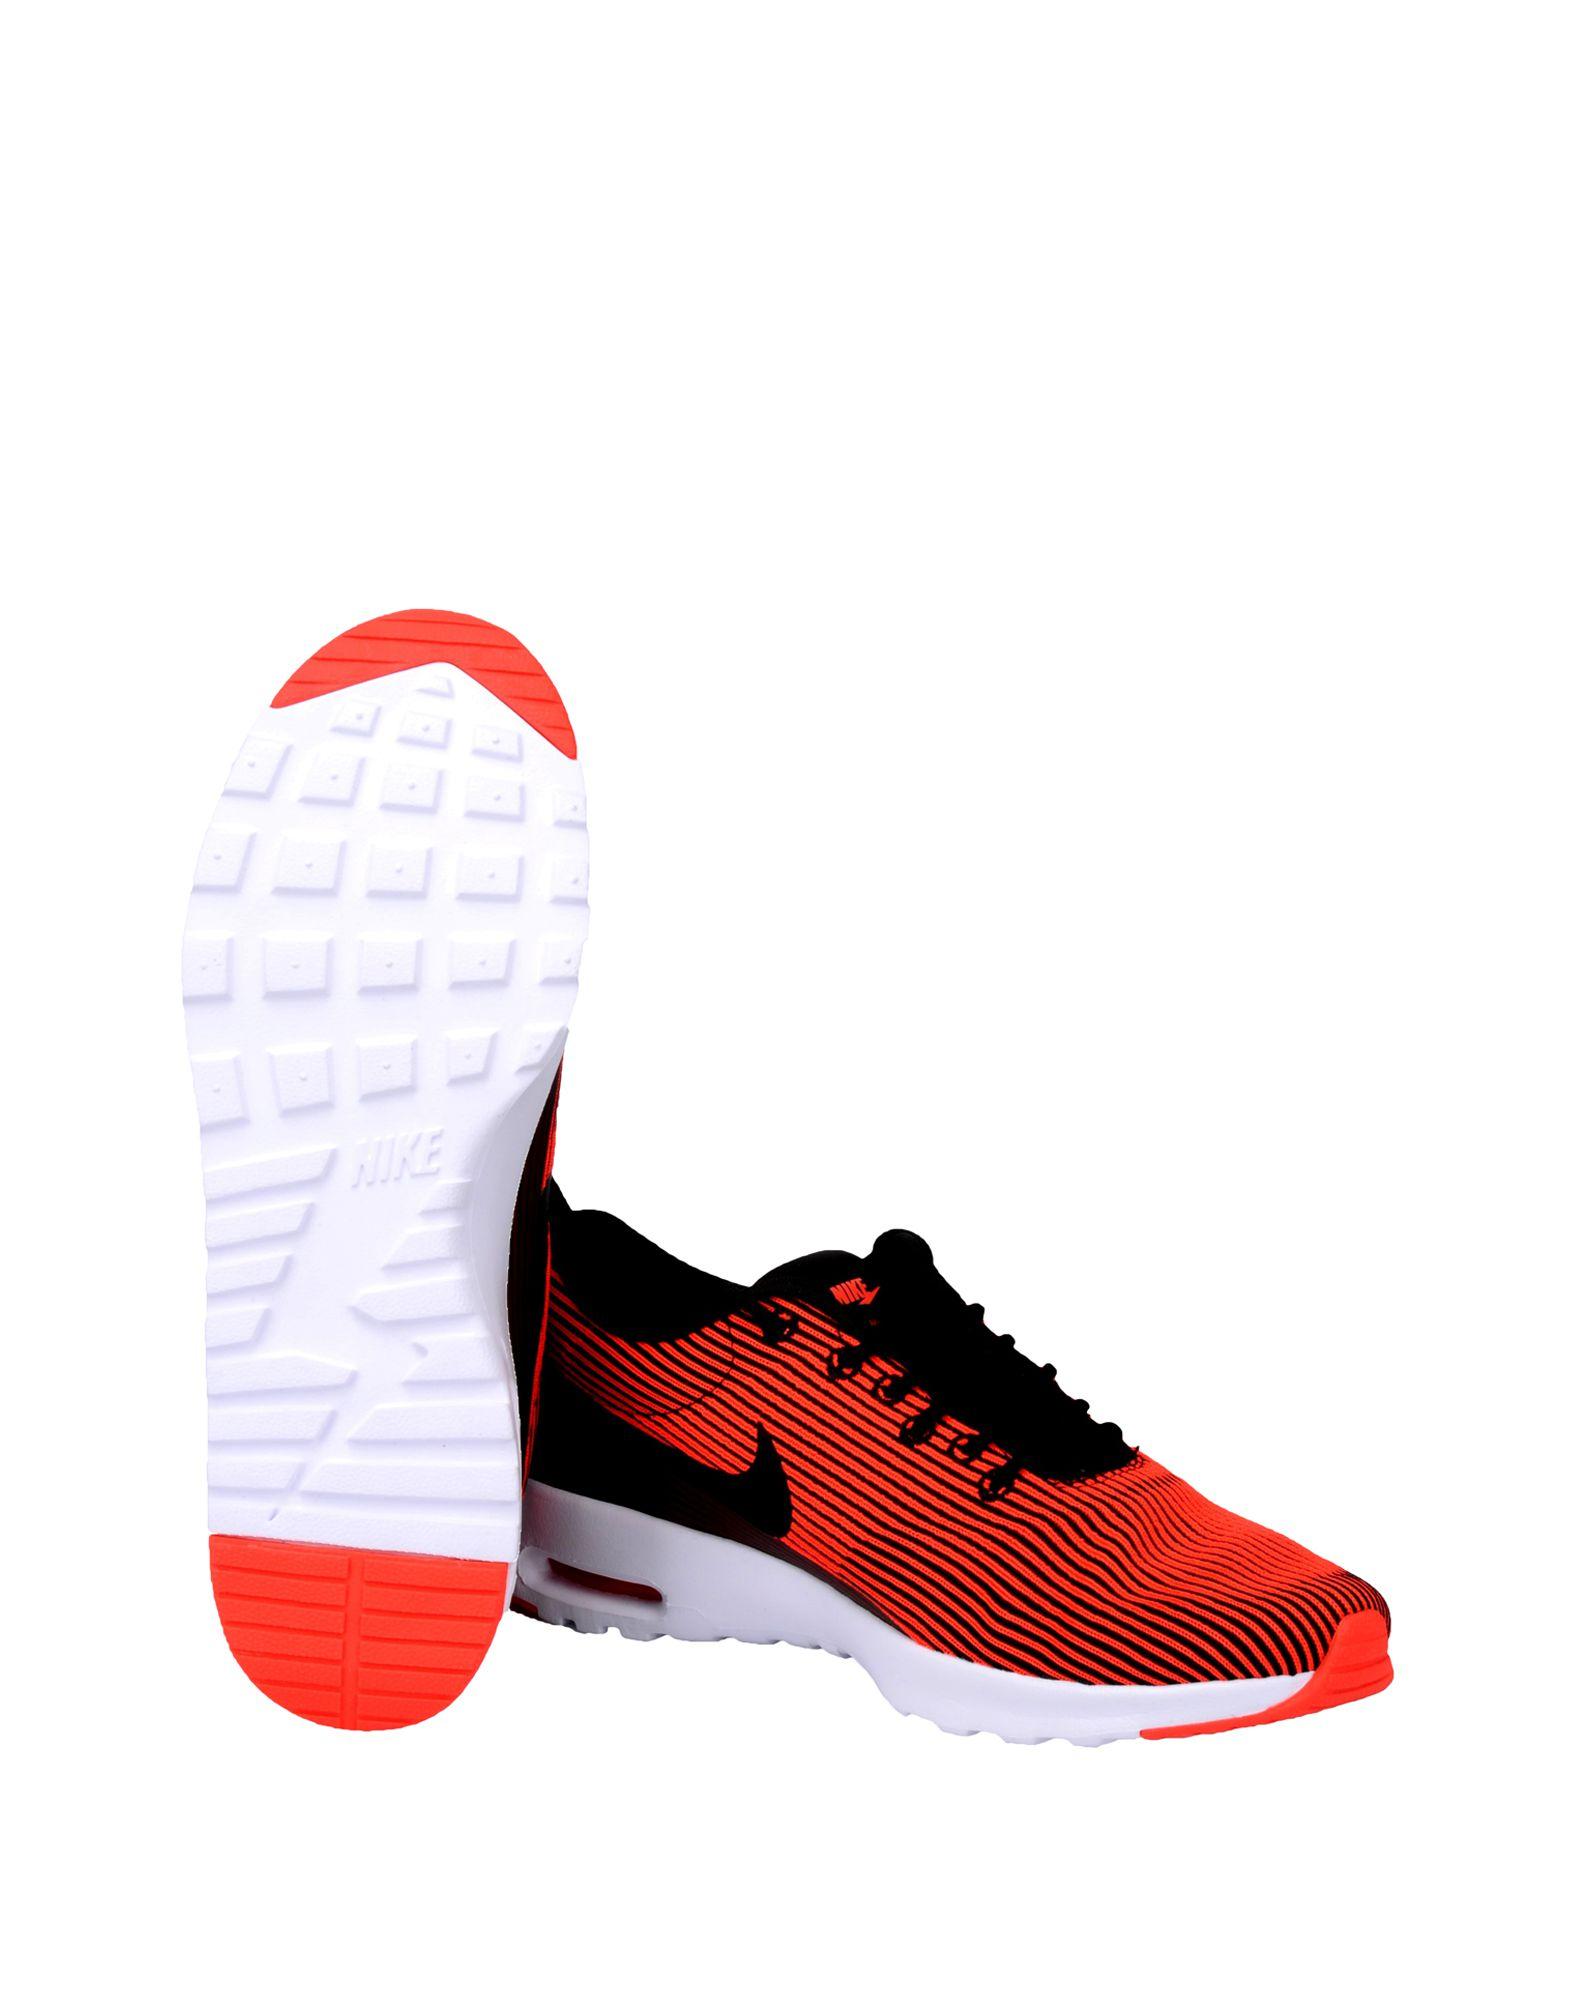 Nike W Nike Air Max Thea Kjcrd  44998351JR Schuhe Gute Qualität beliebte Schuhe 44998351JR 5c2b62